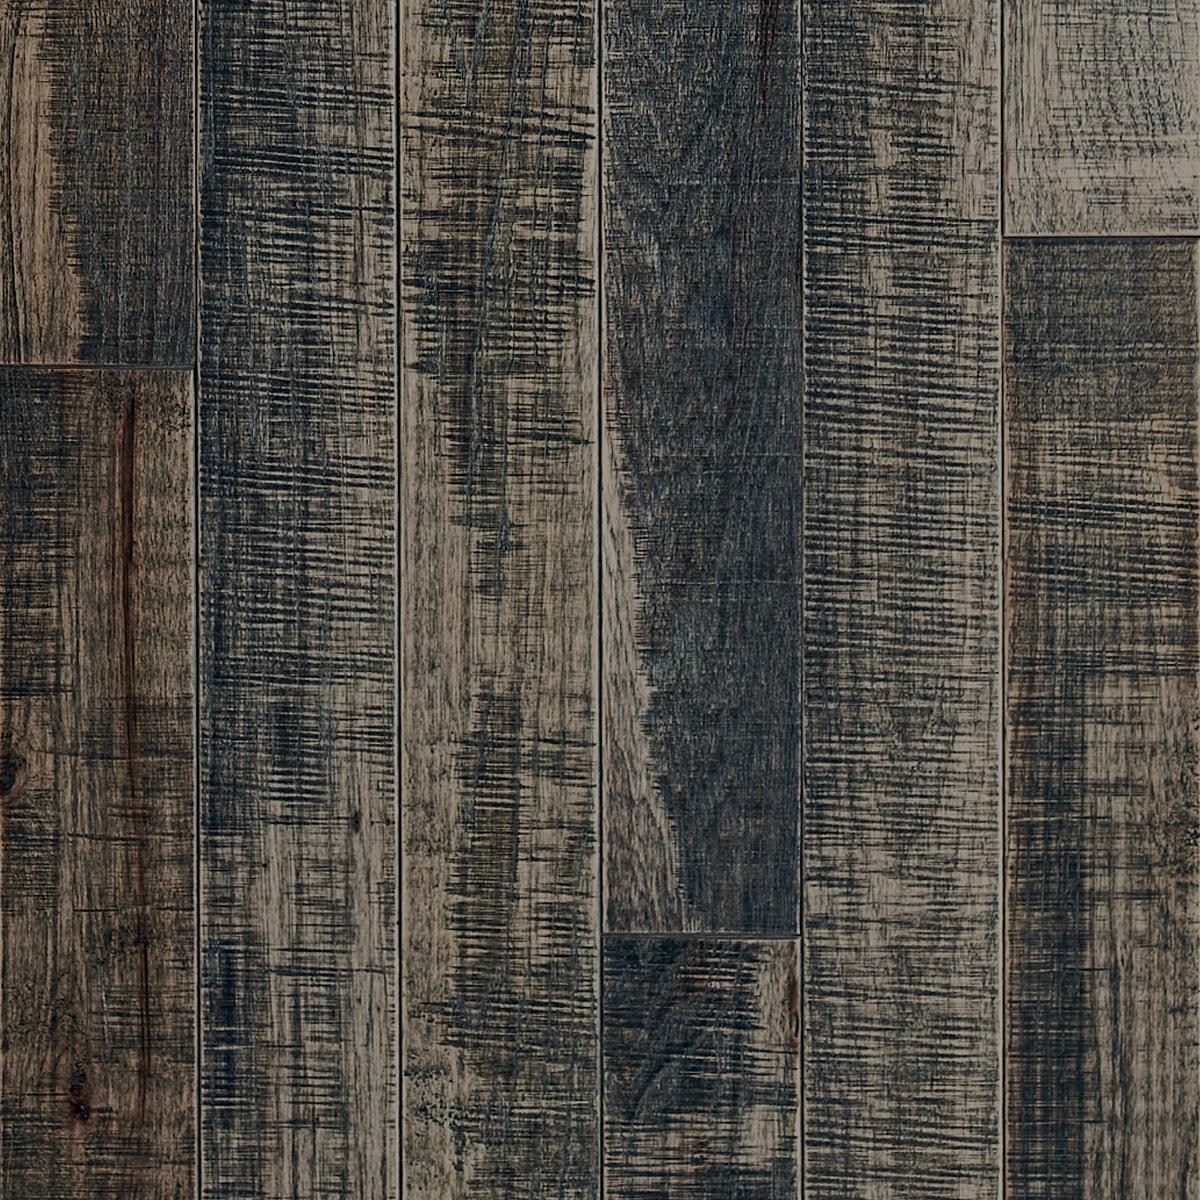 Wyoming hardwood floor